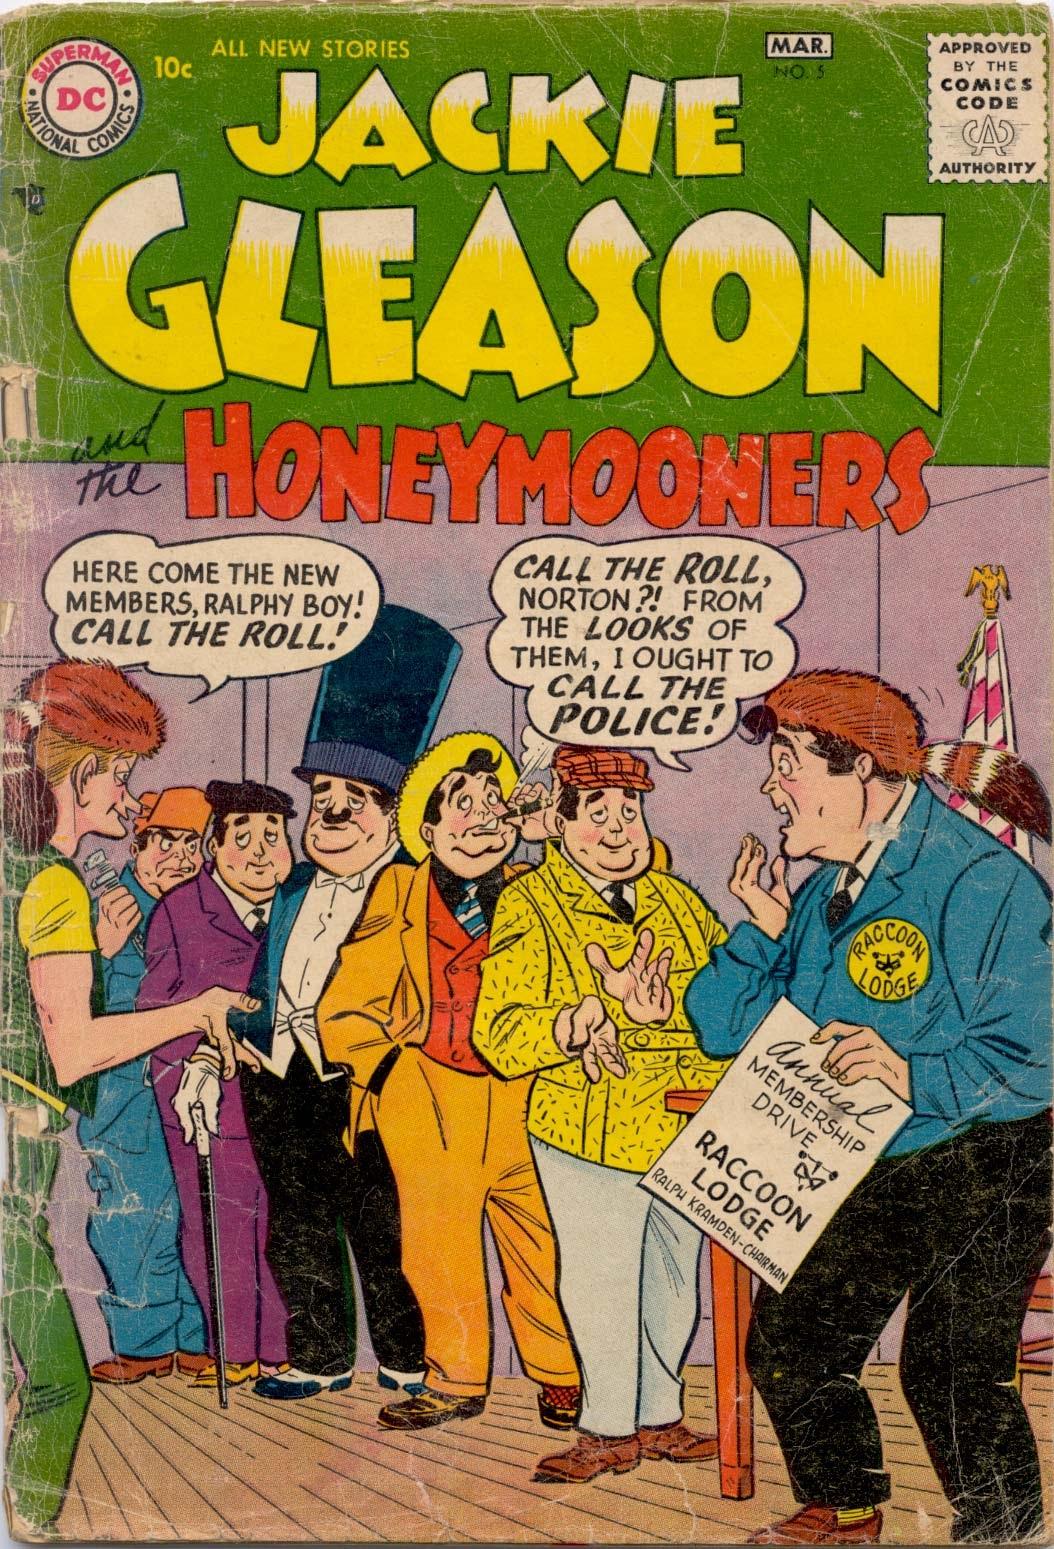 Jackie Gleason and the Honeymooners 5 Page 1